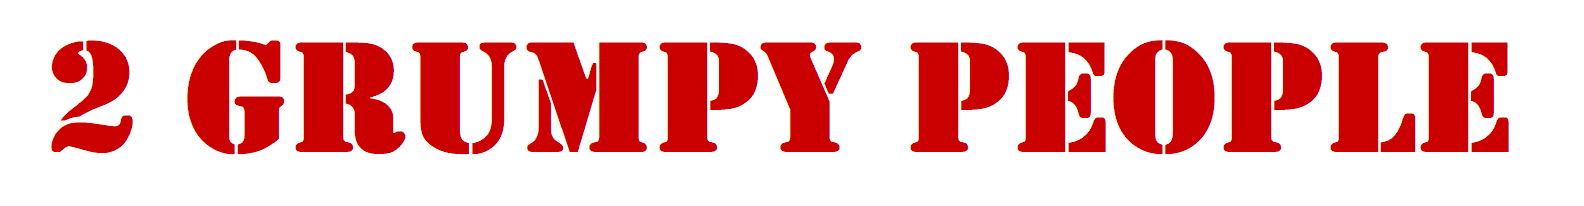 2GP_wordmark2.png